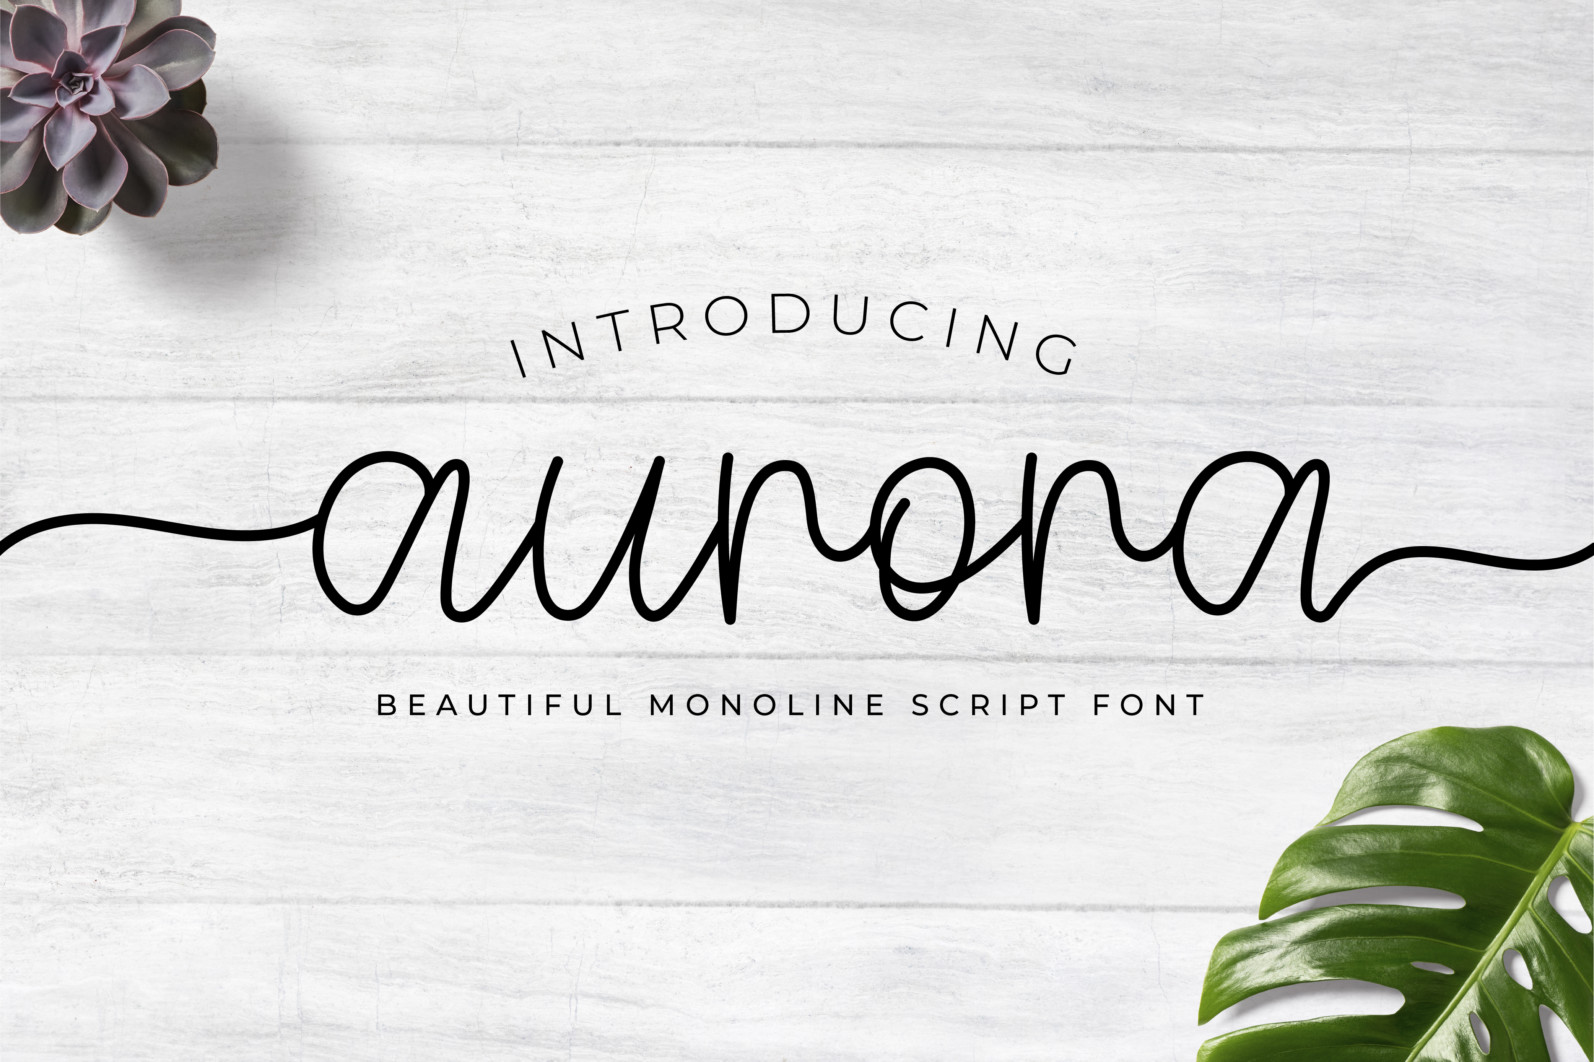 Aurora — Beautiful Monoline Script Font - Artboard 1 2 scaled -